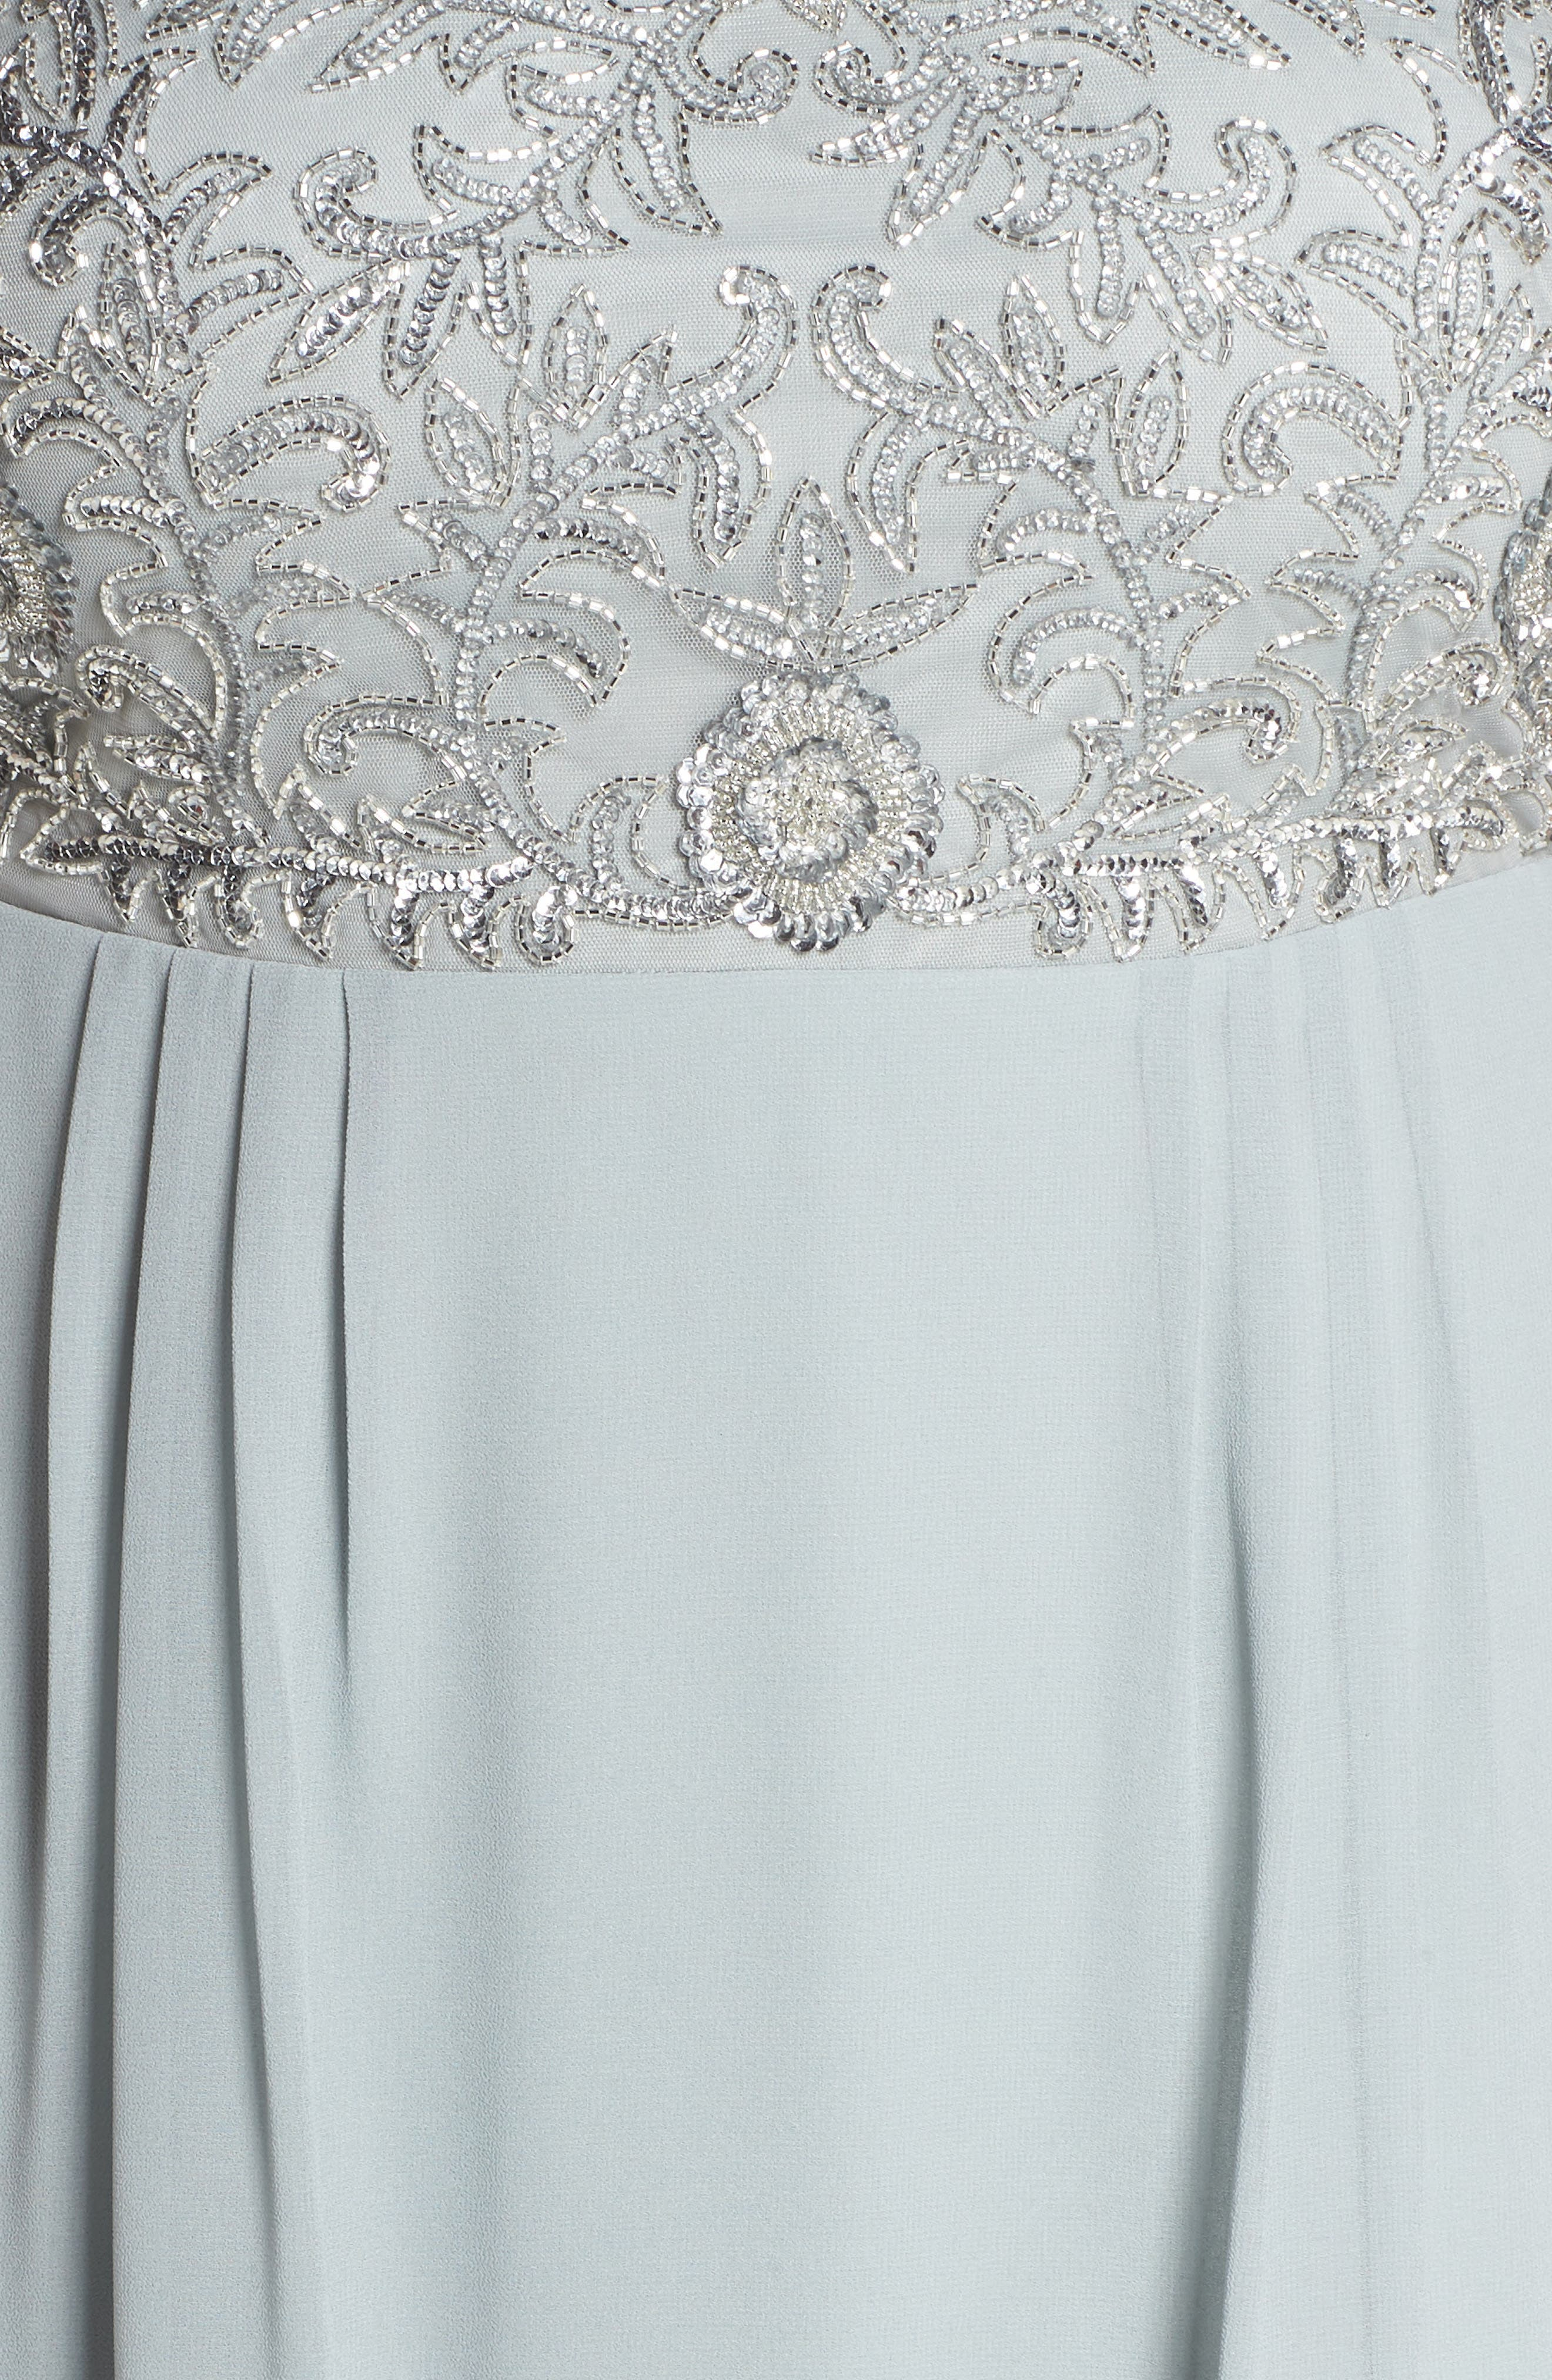 Beaded Midi Dress,                             Alternate thumbnail 5, color,                             484